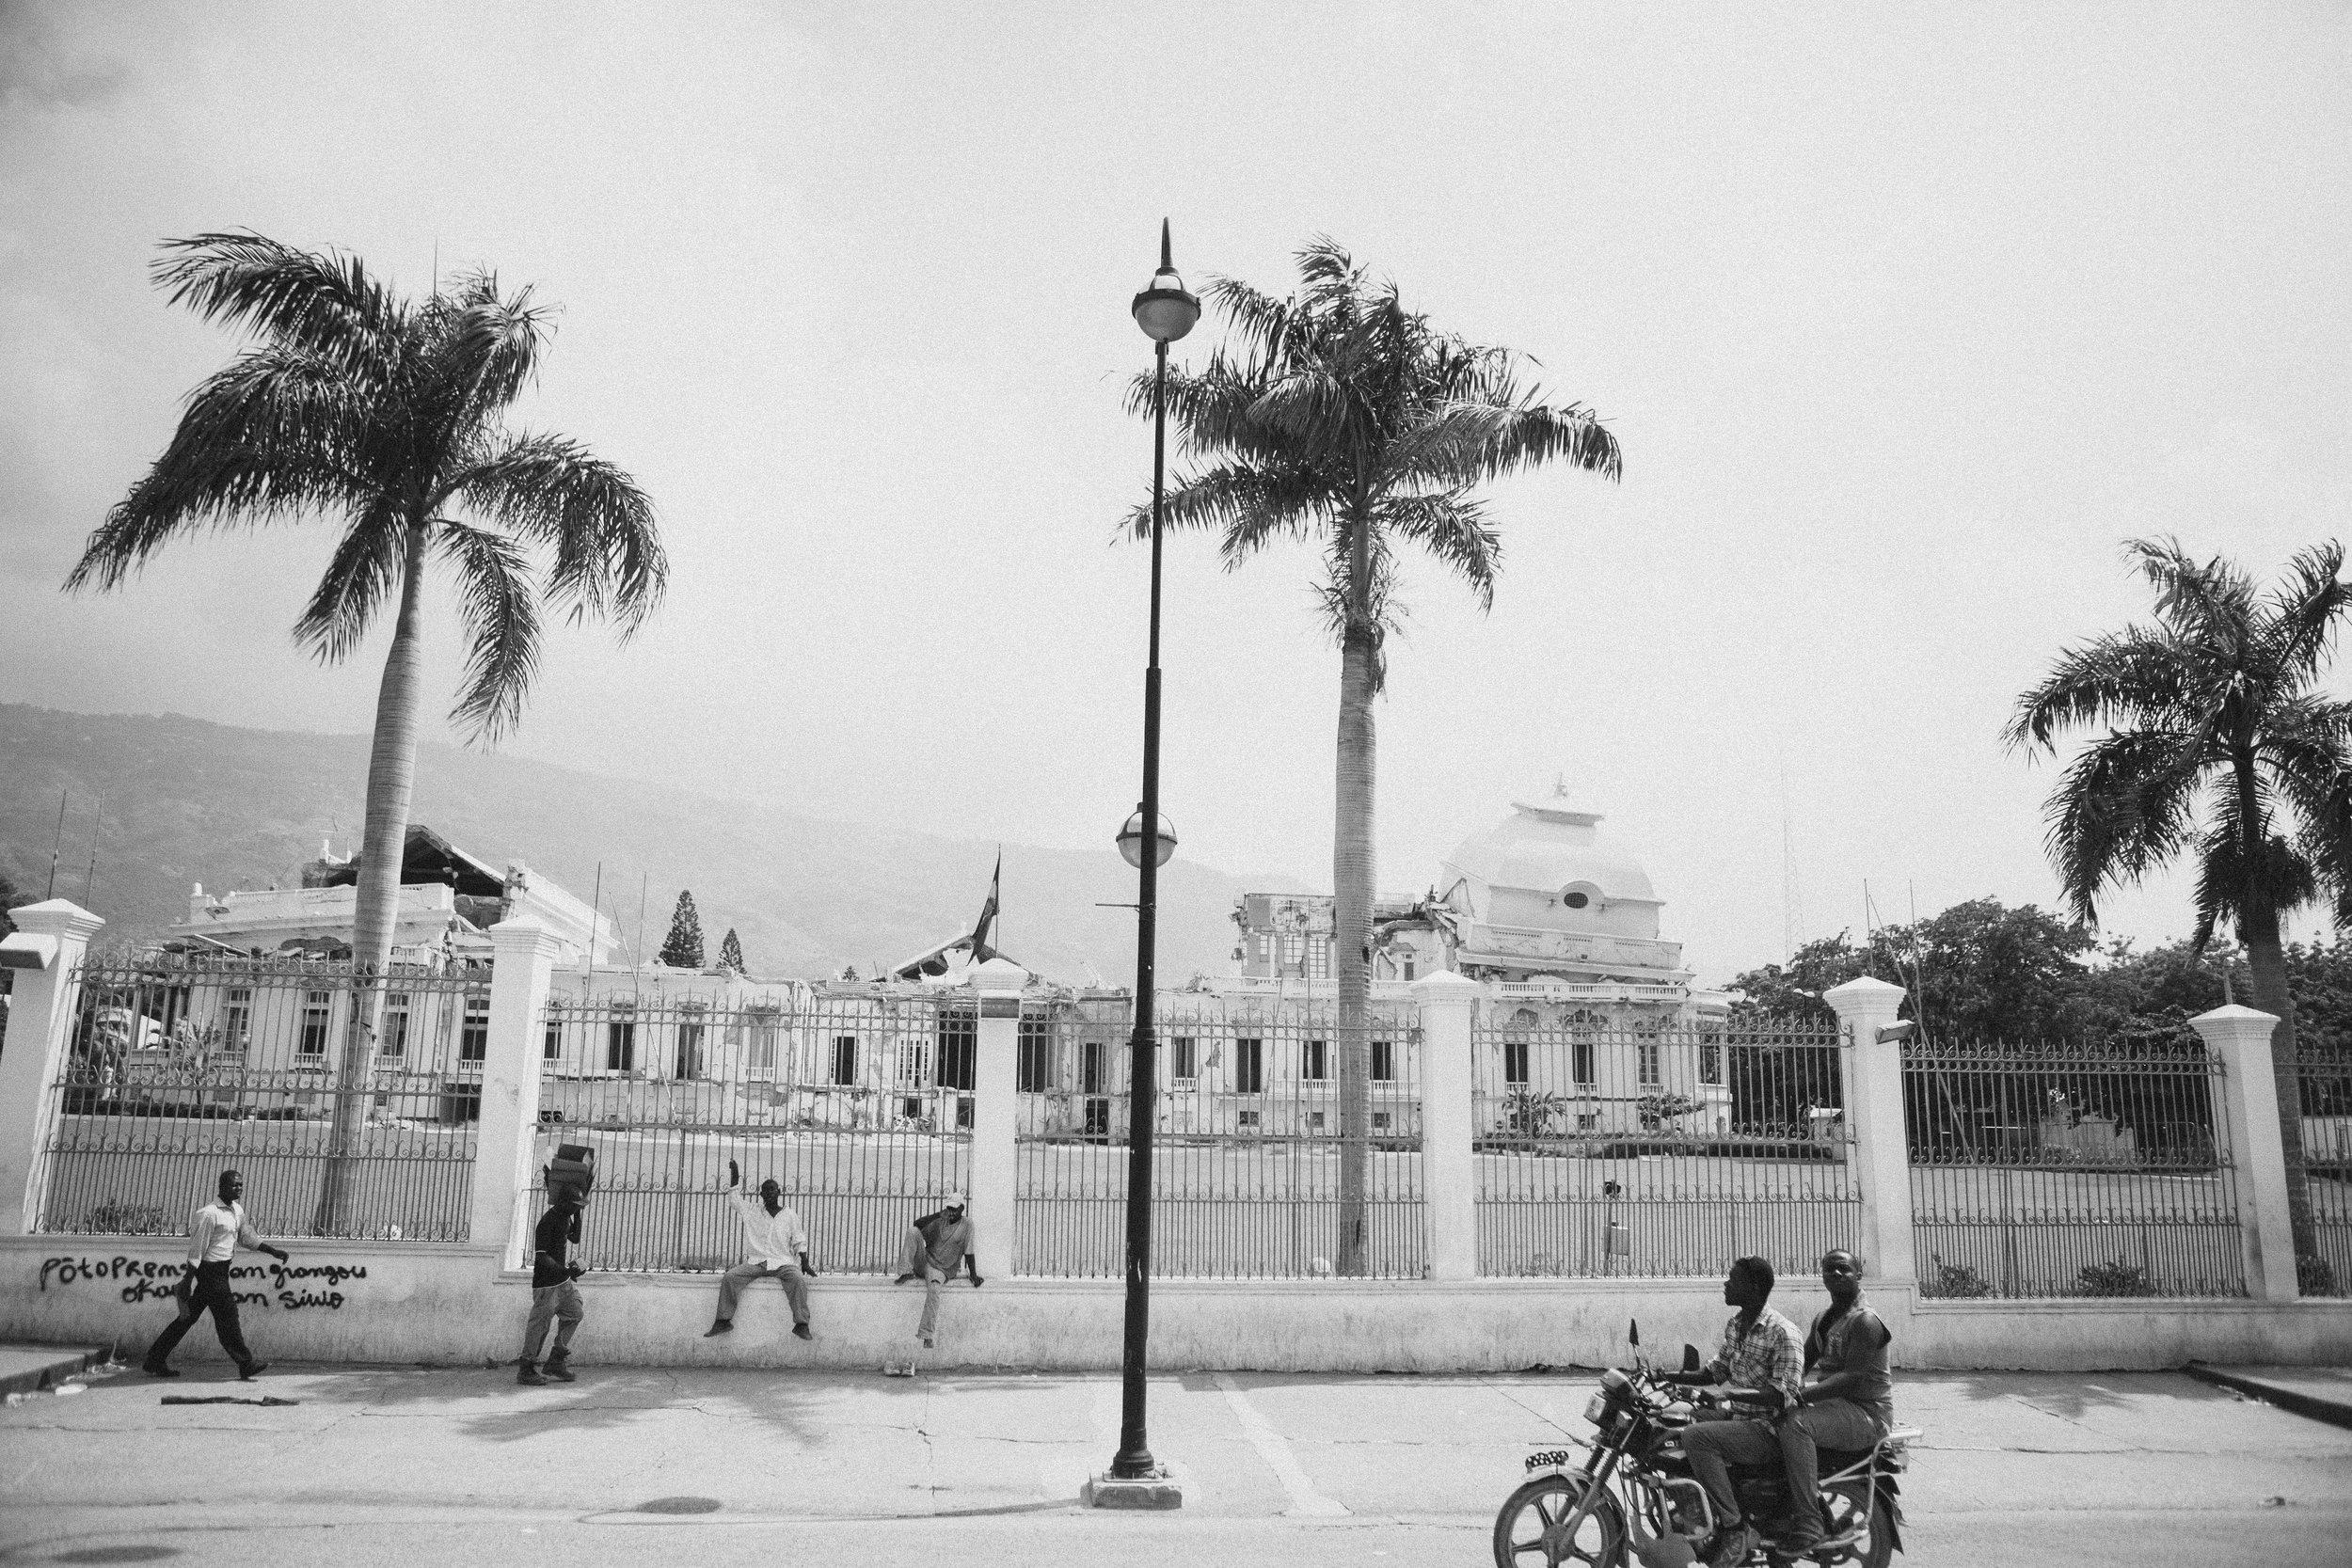 Haiti_Street_Scenes_004.jpg